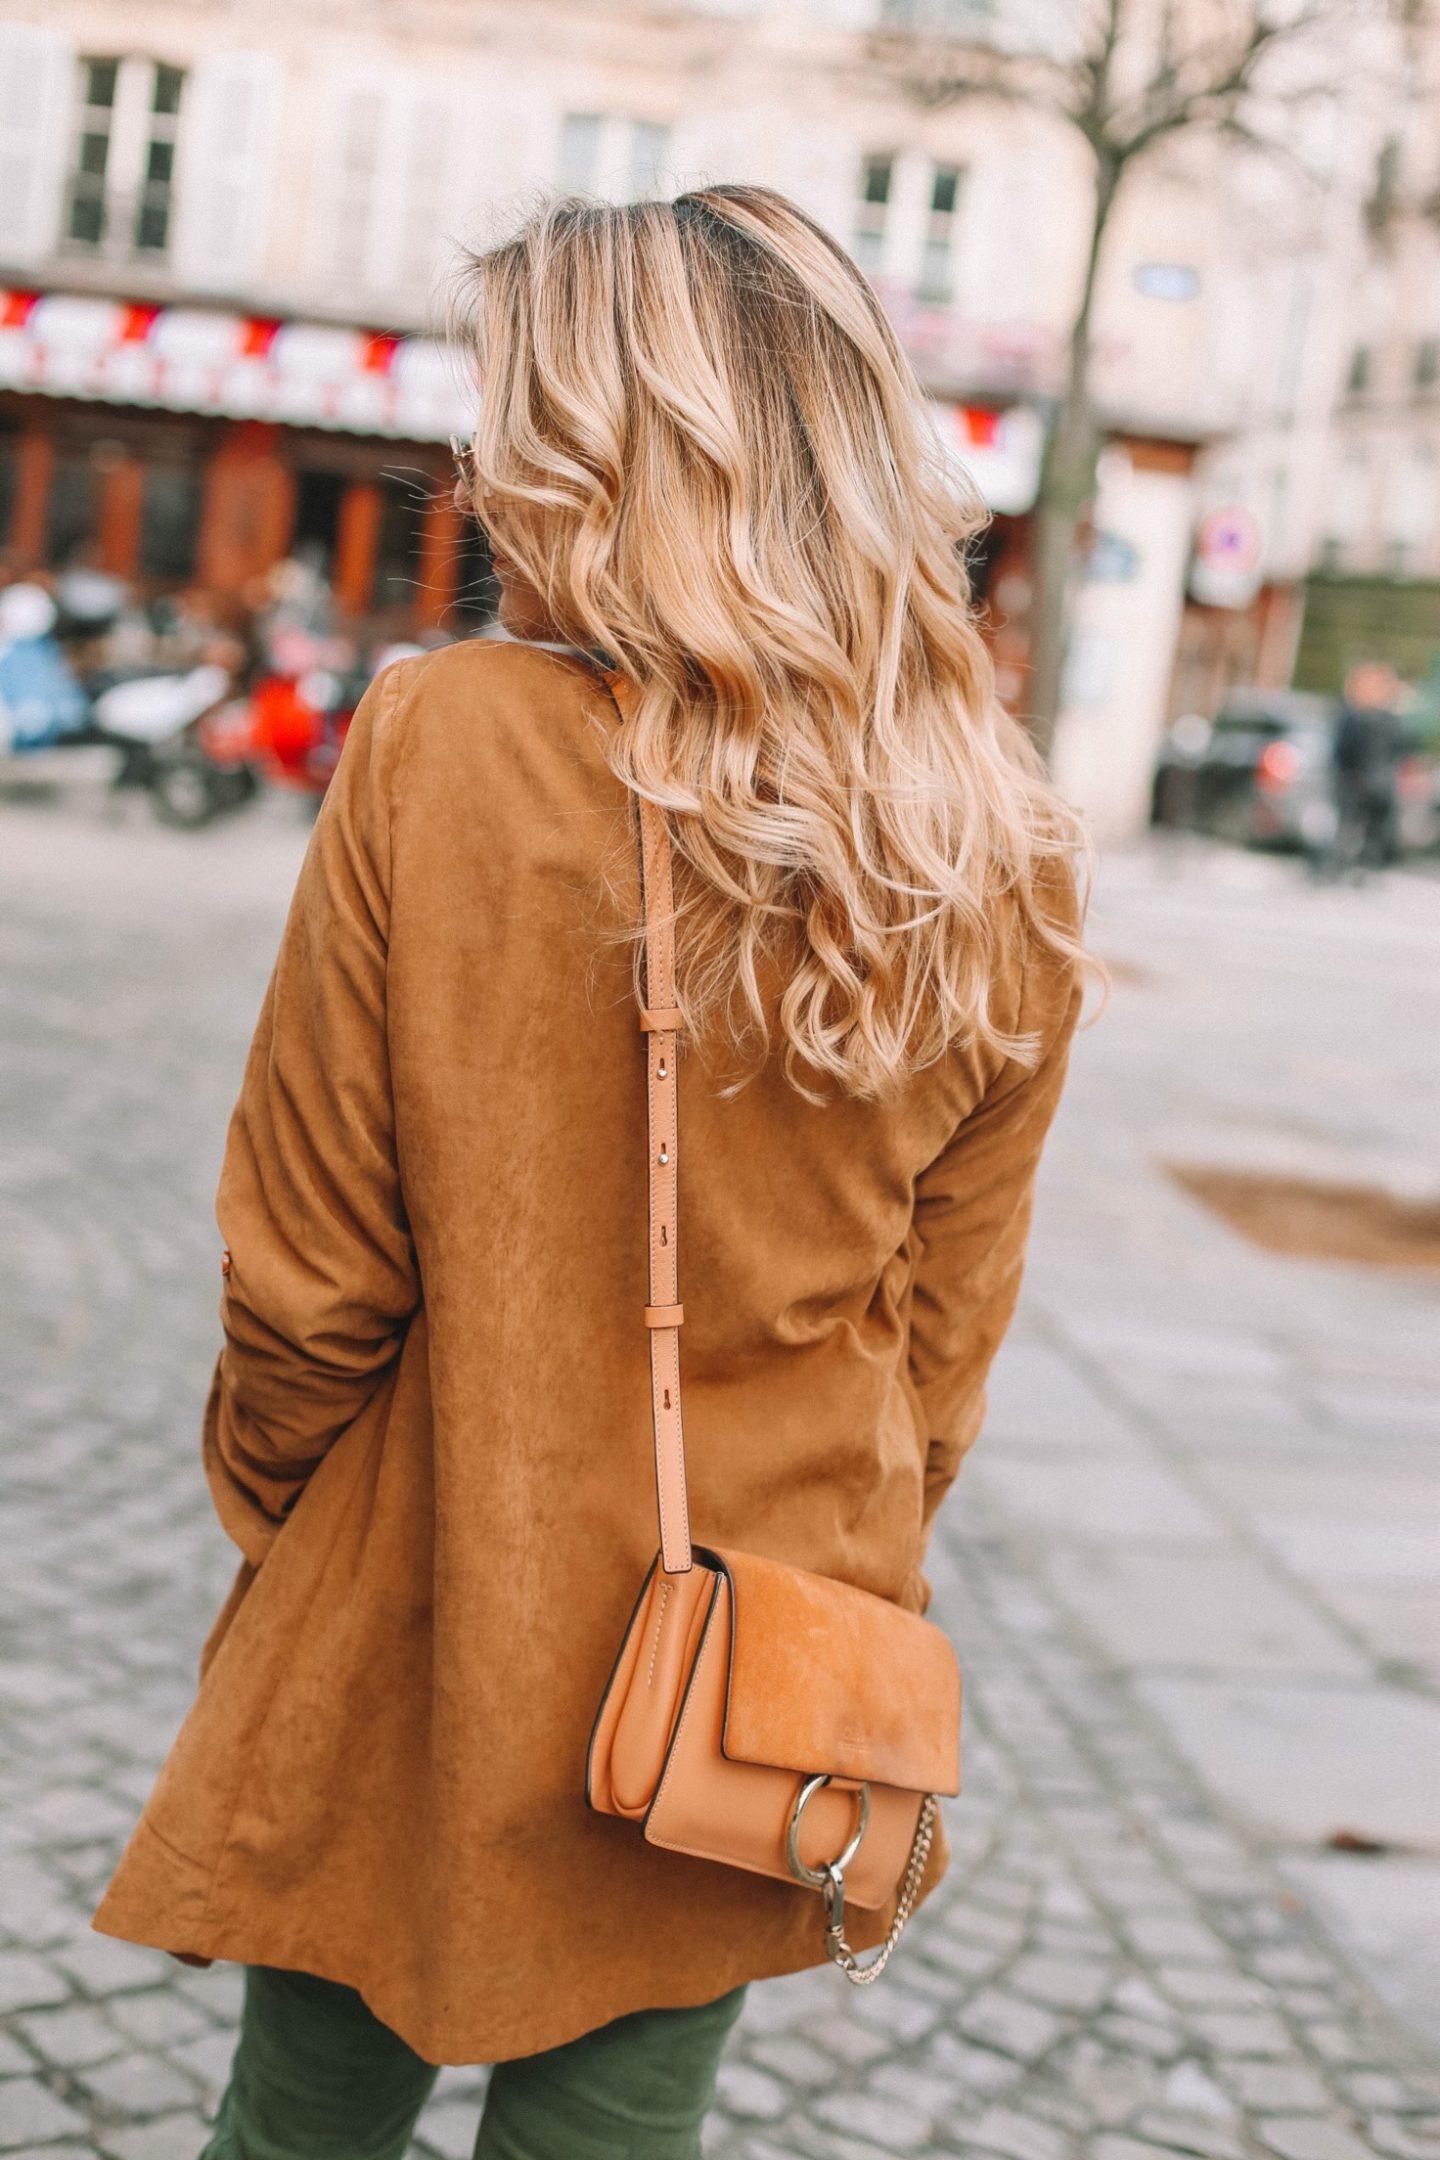 Cheveux blond - Blondie Baby blog mode et voyages